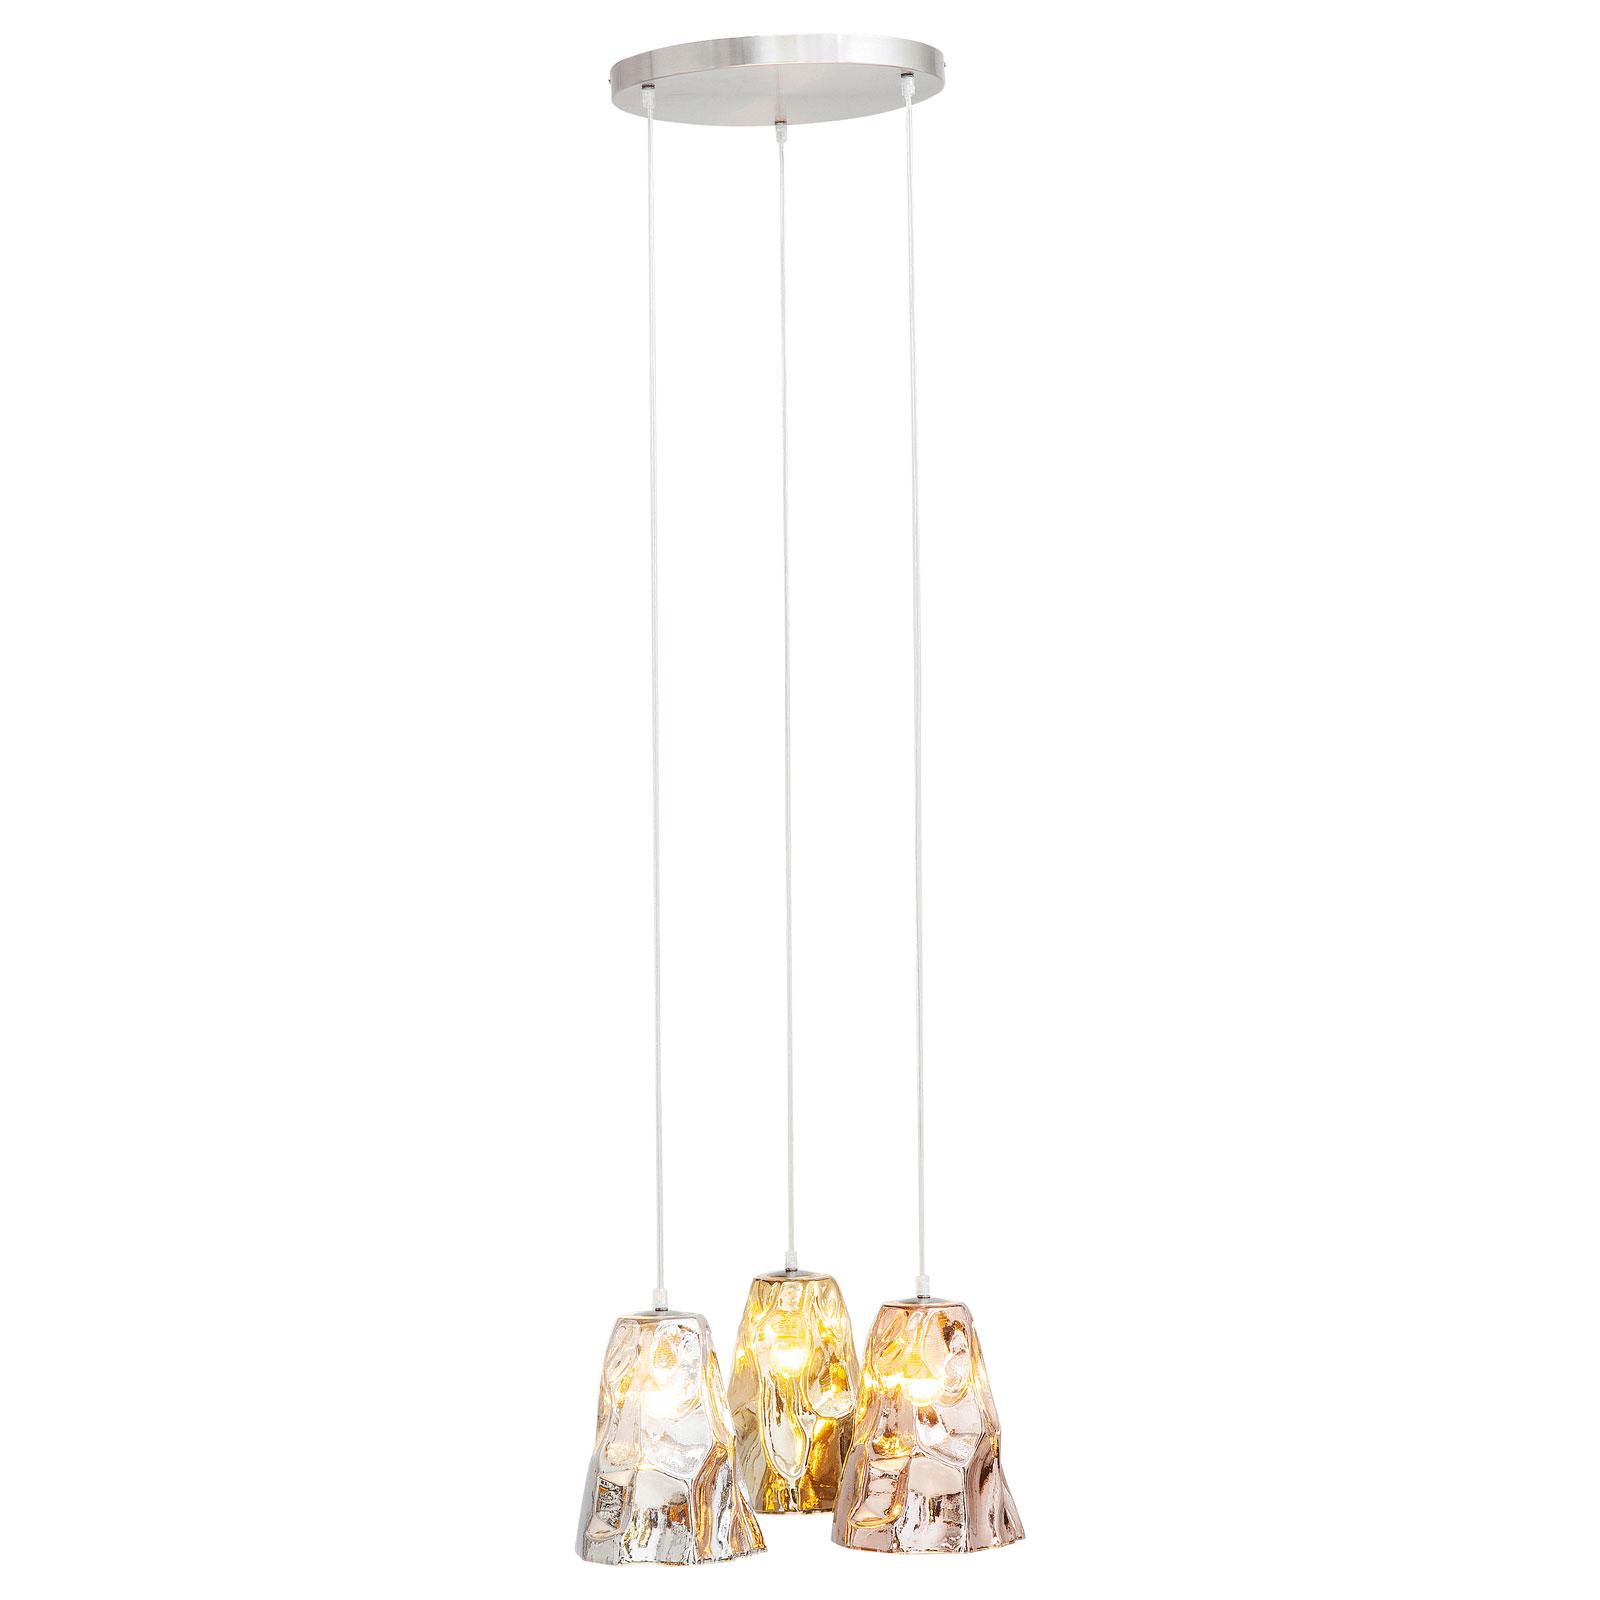 KARE Crumble Tricolore lampa wisząca, Ø 57 cm